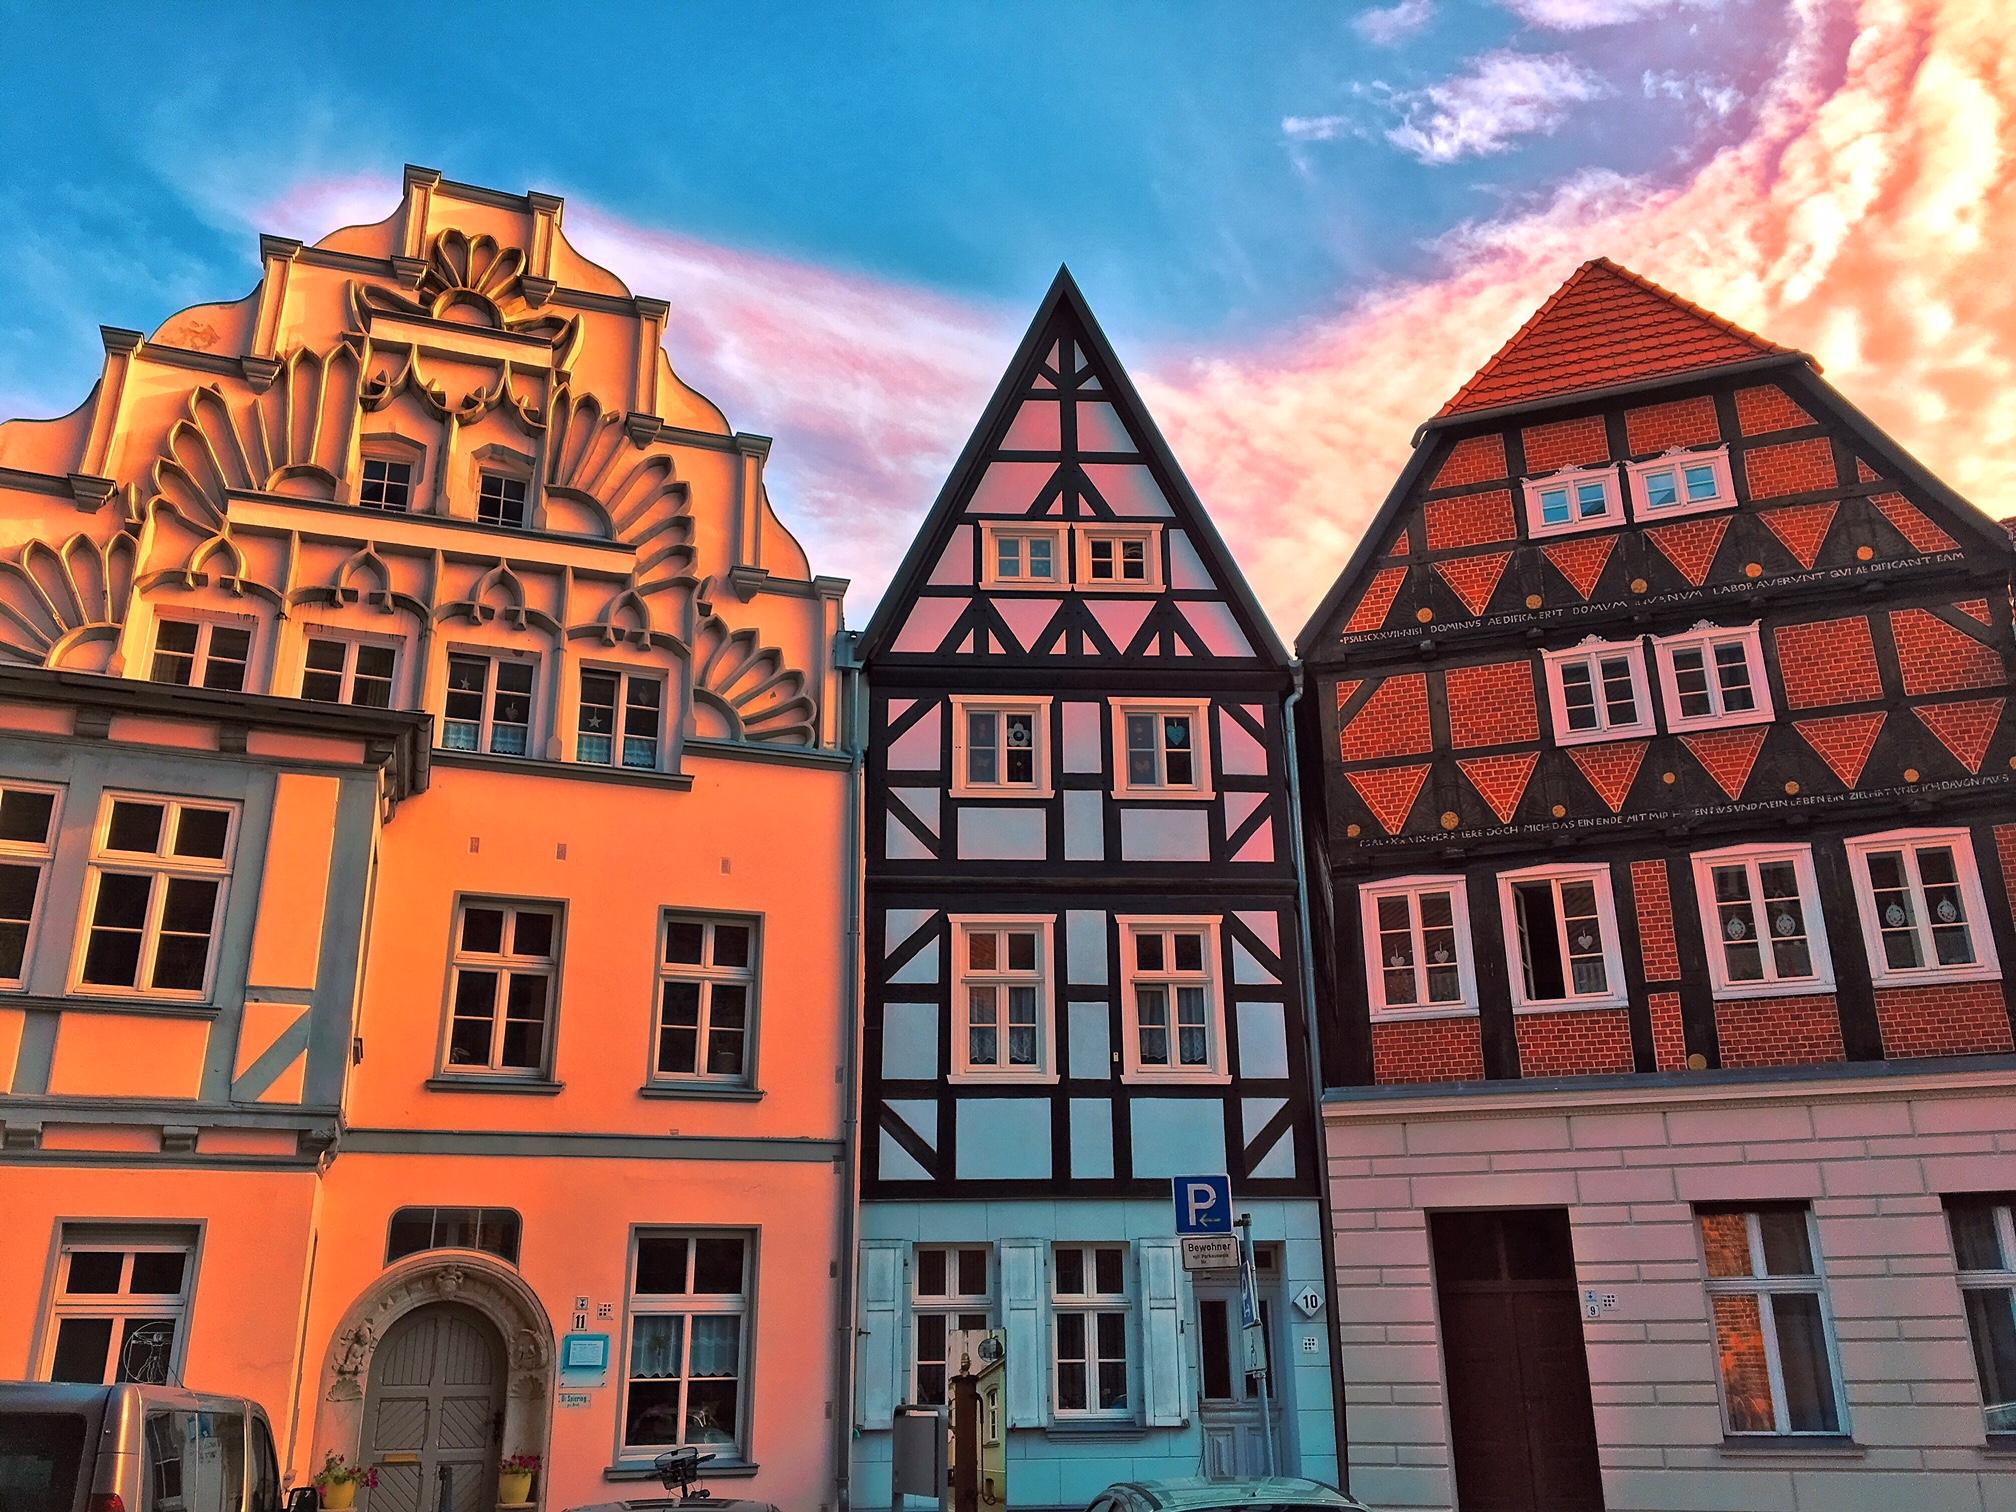 Perleberg, Germany